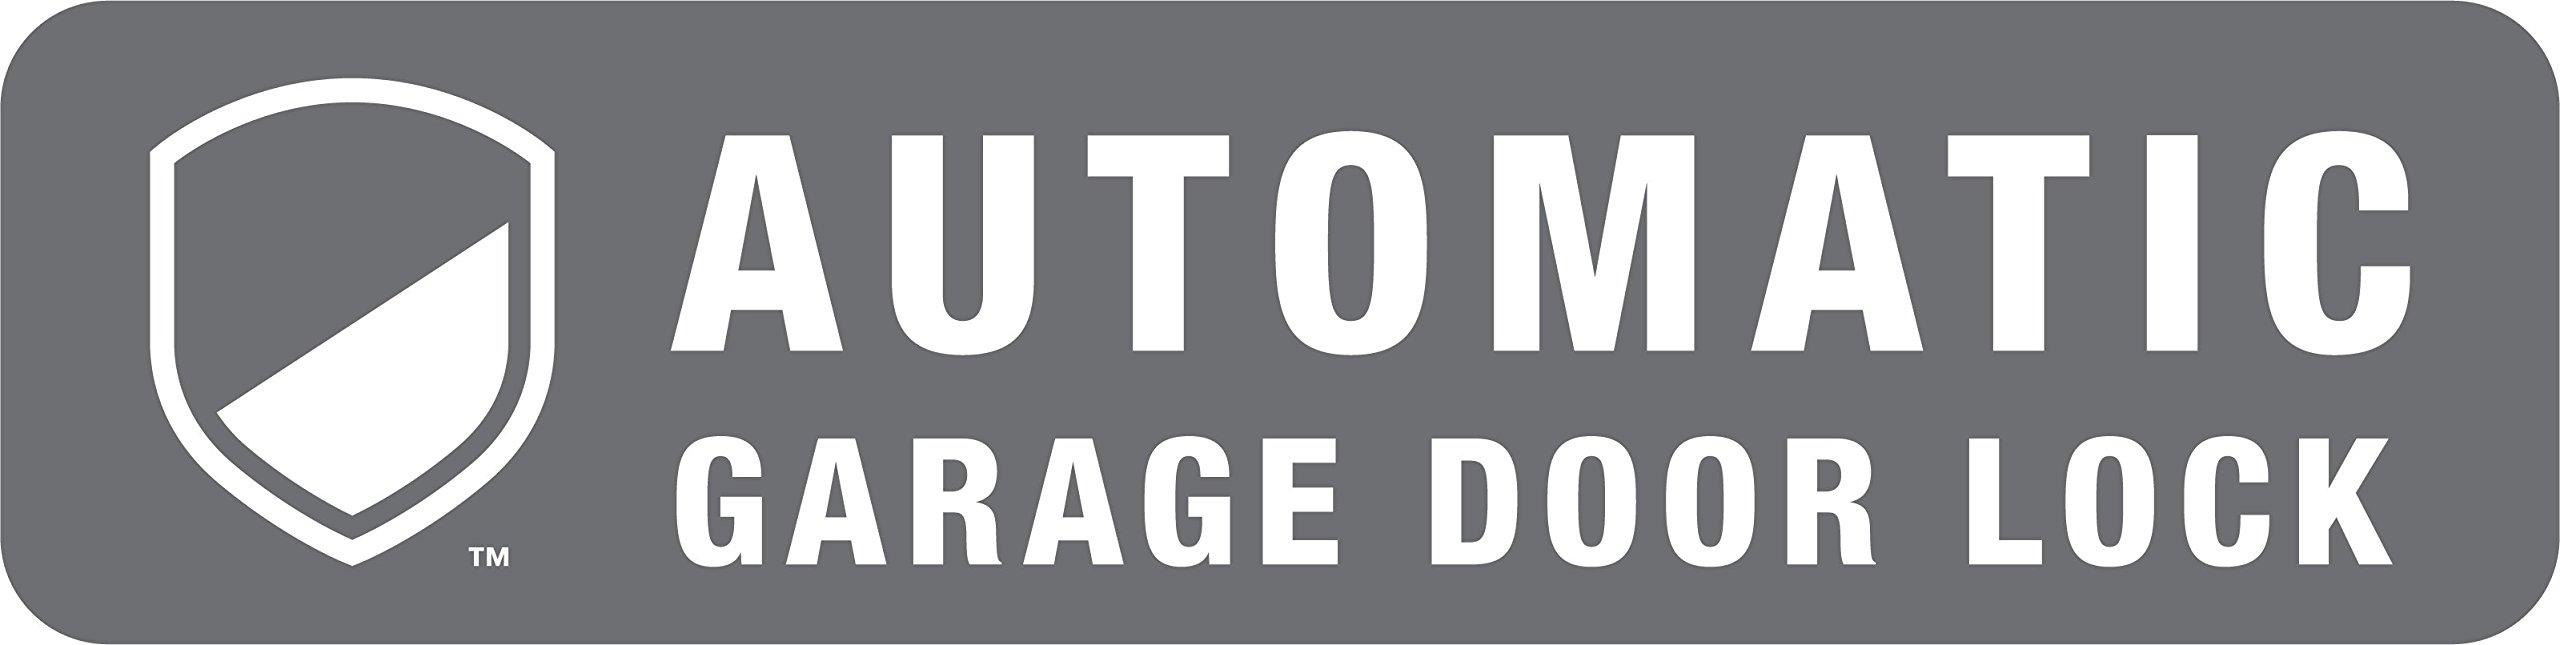 Liftmaster 841LM Automatic Garage Door Lock